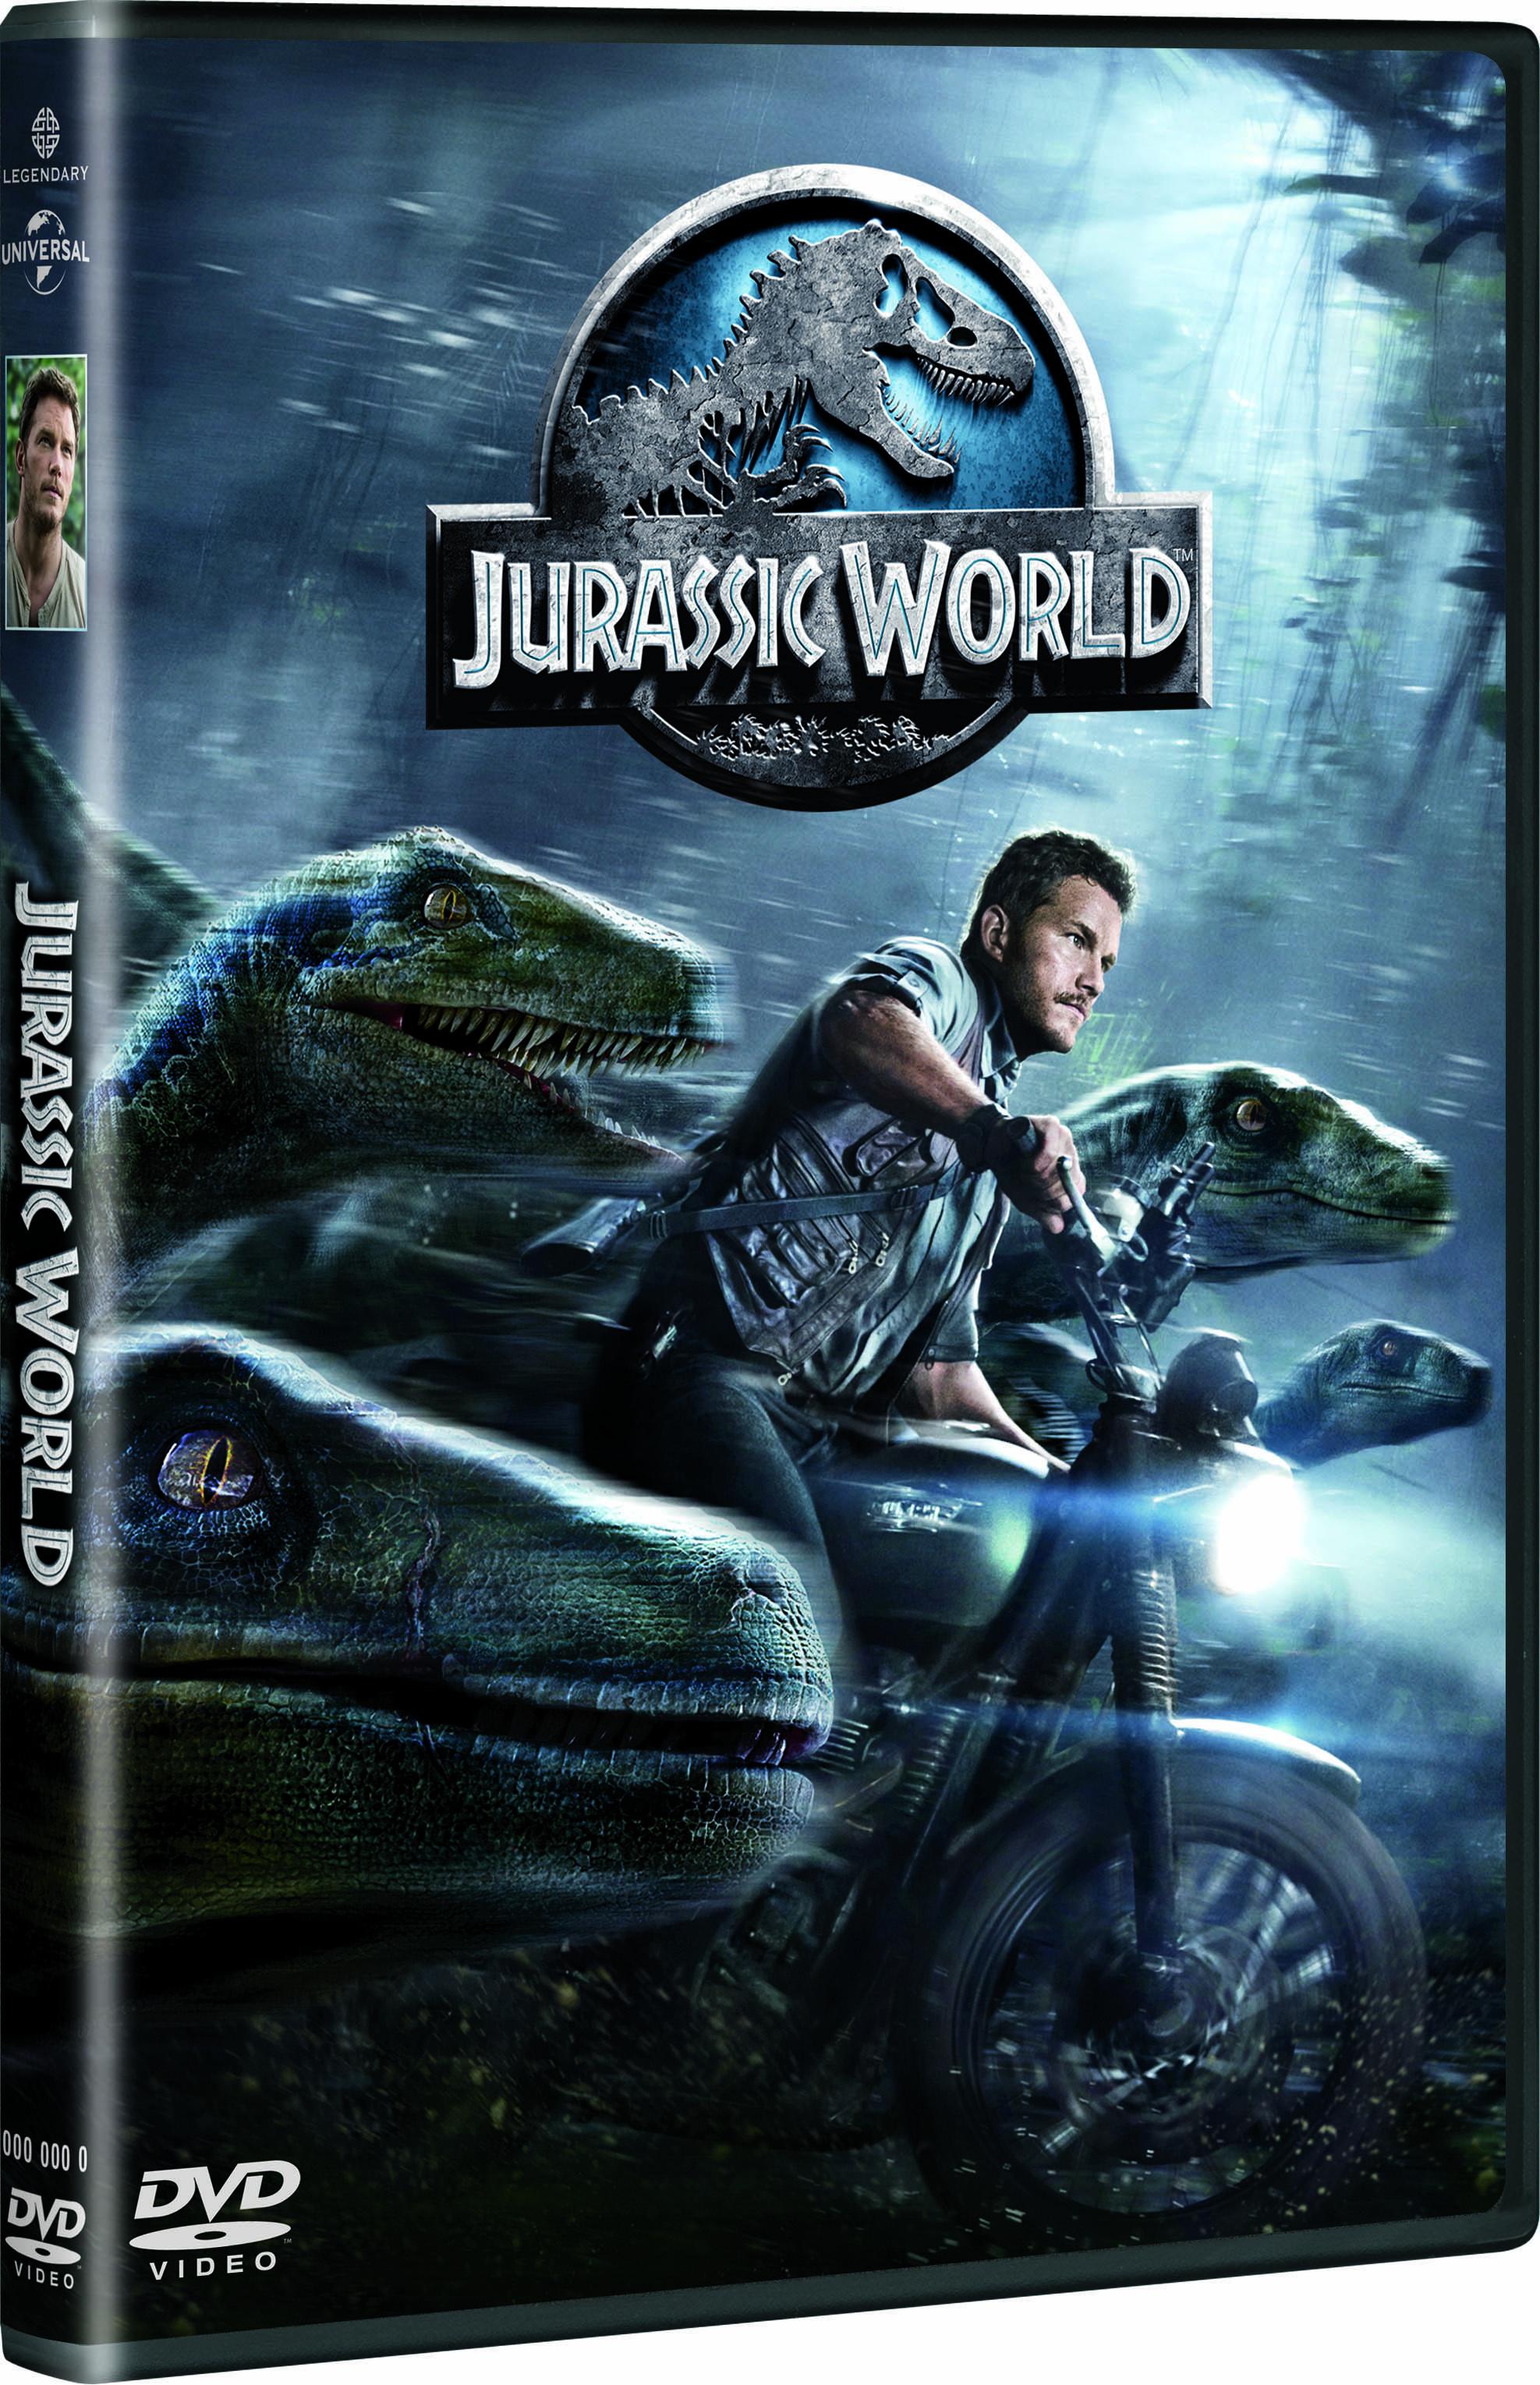 Jurassic World / Jurassic World thumbnail